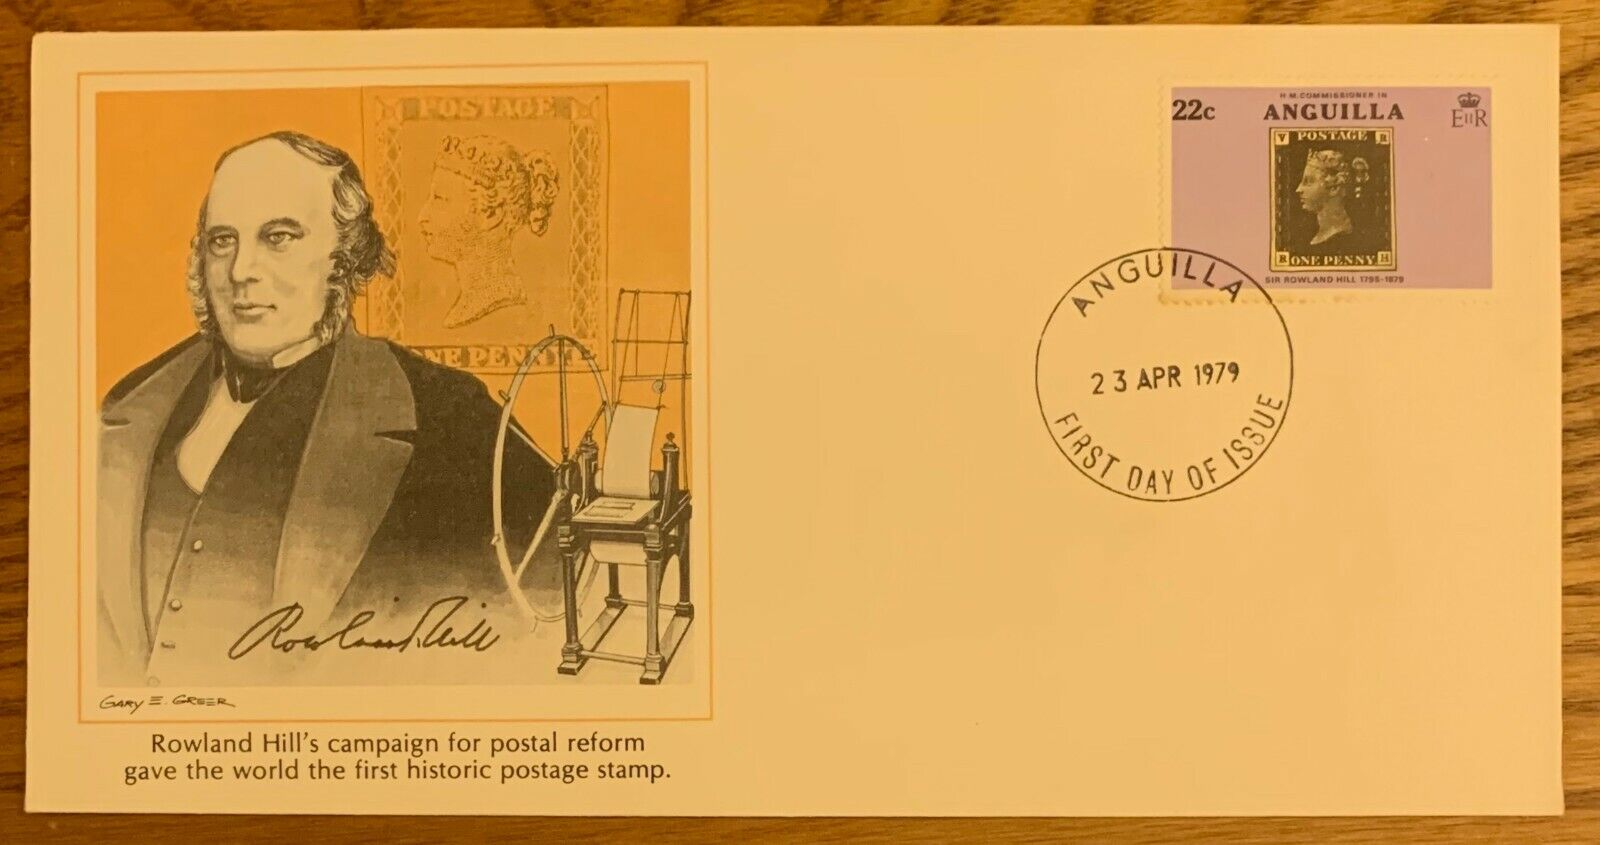 ROWLAND HILL, RARE 4-23-1979 ANGUILLA FIRST DAY COVER - $2.97